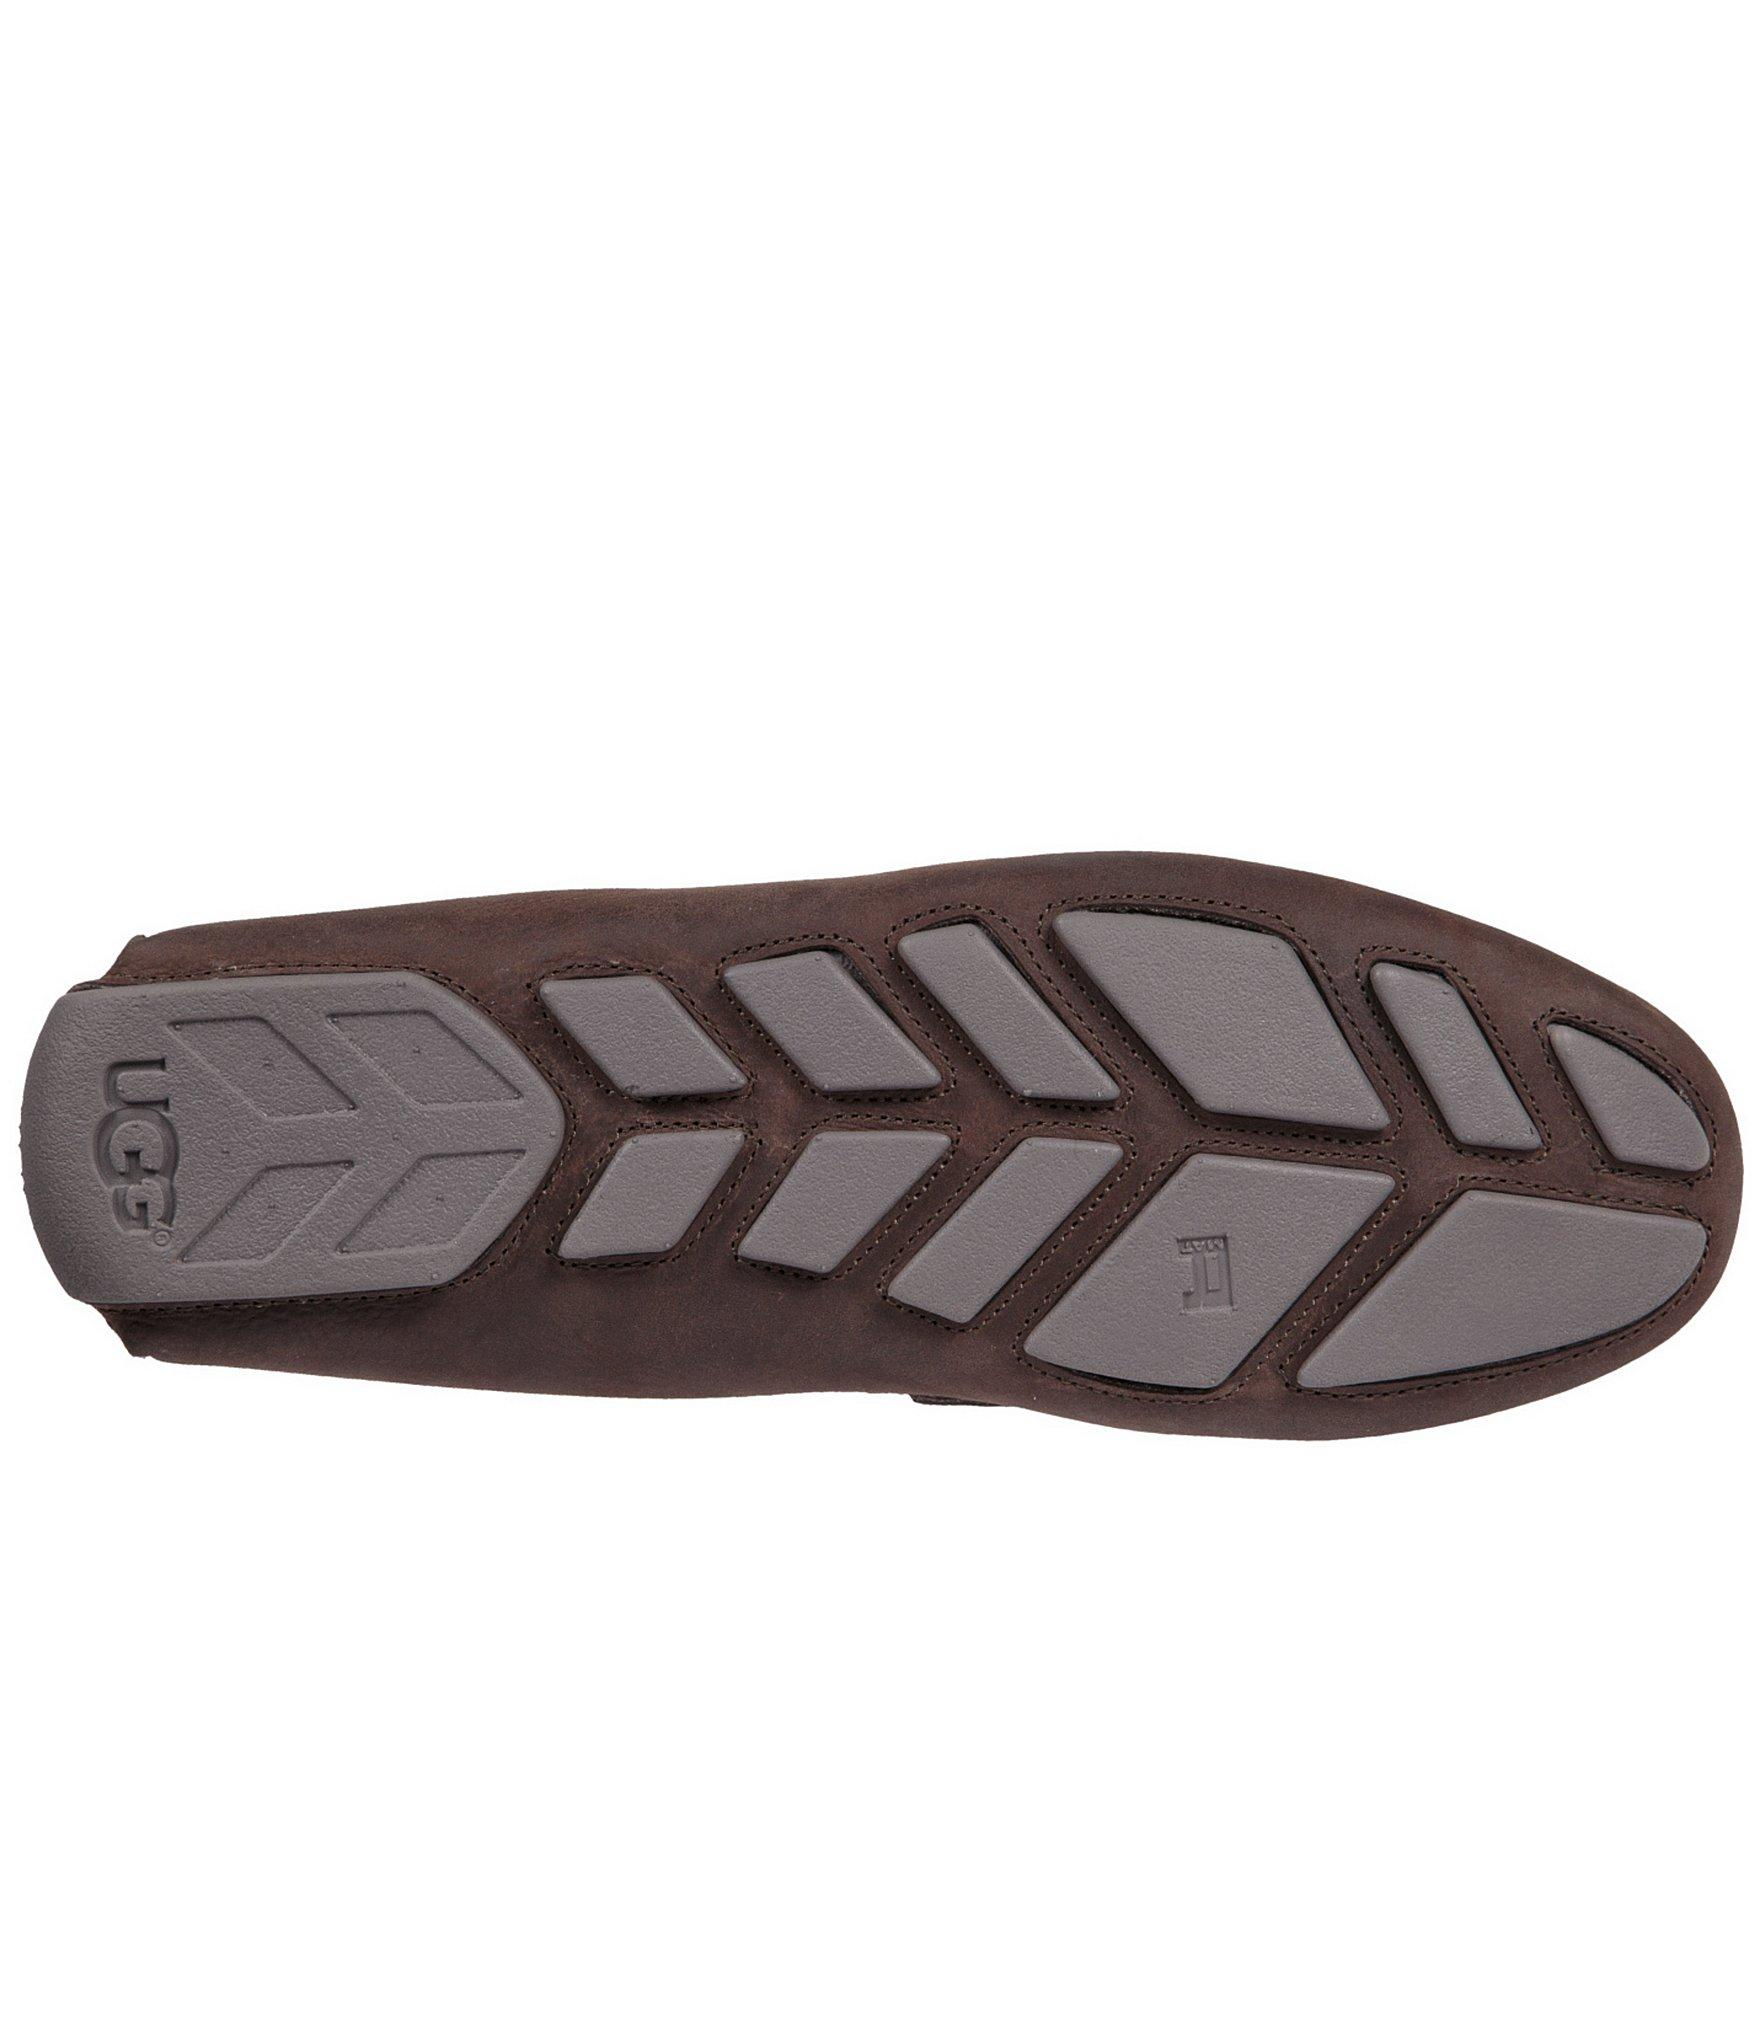 e0f739f9021 Lyst - UGG ® Men ́s Henrick Slippers in Brown for Men